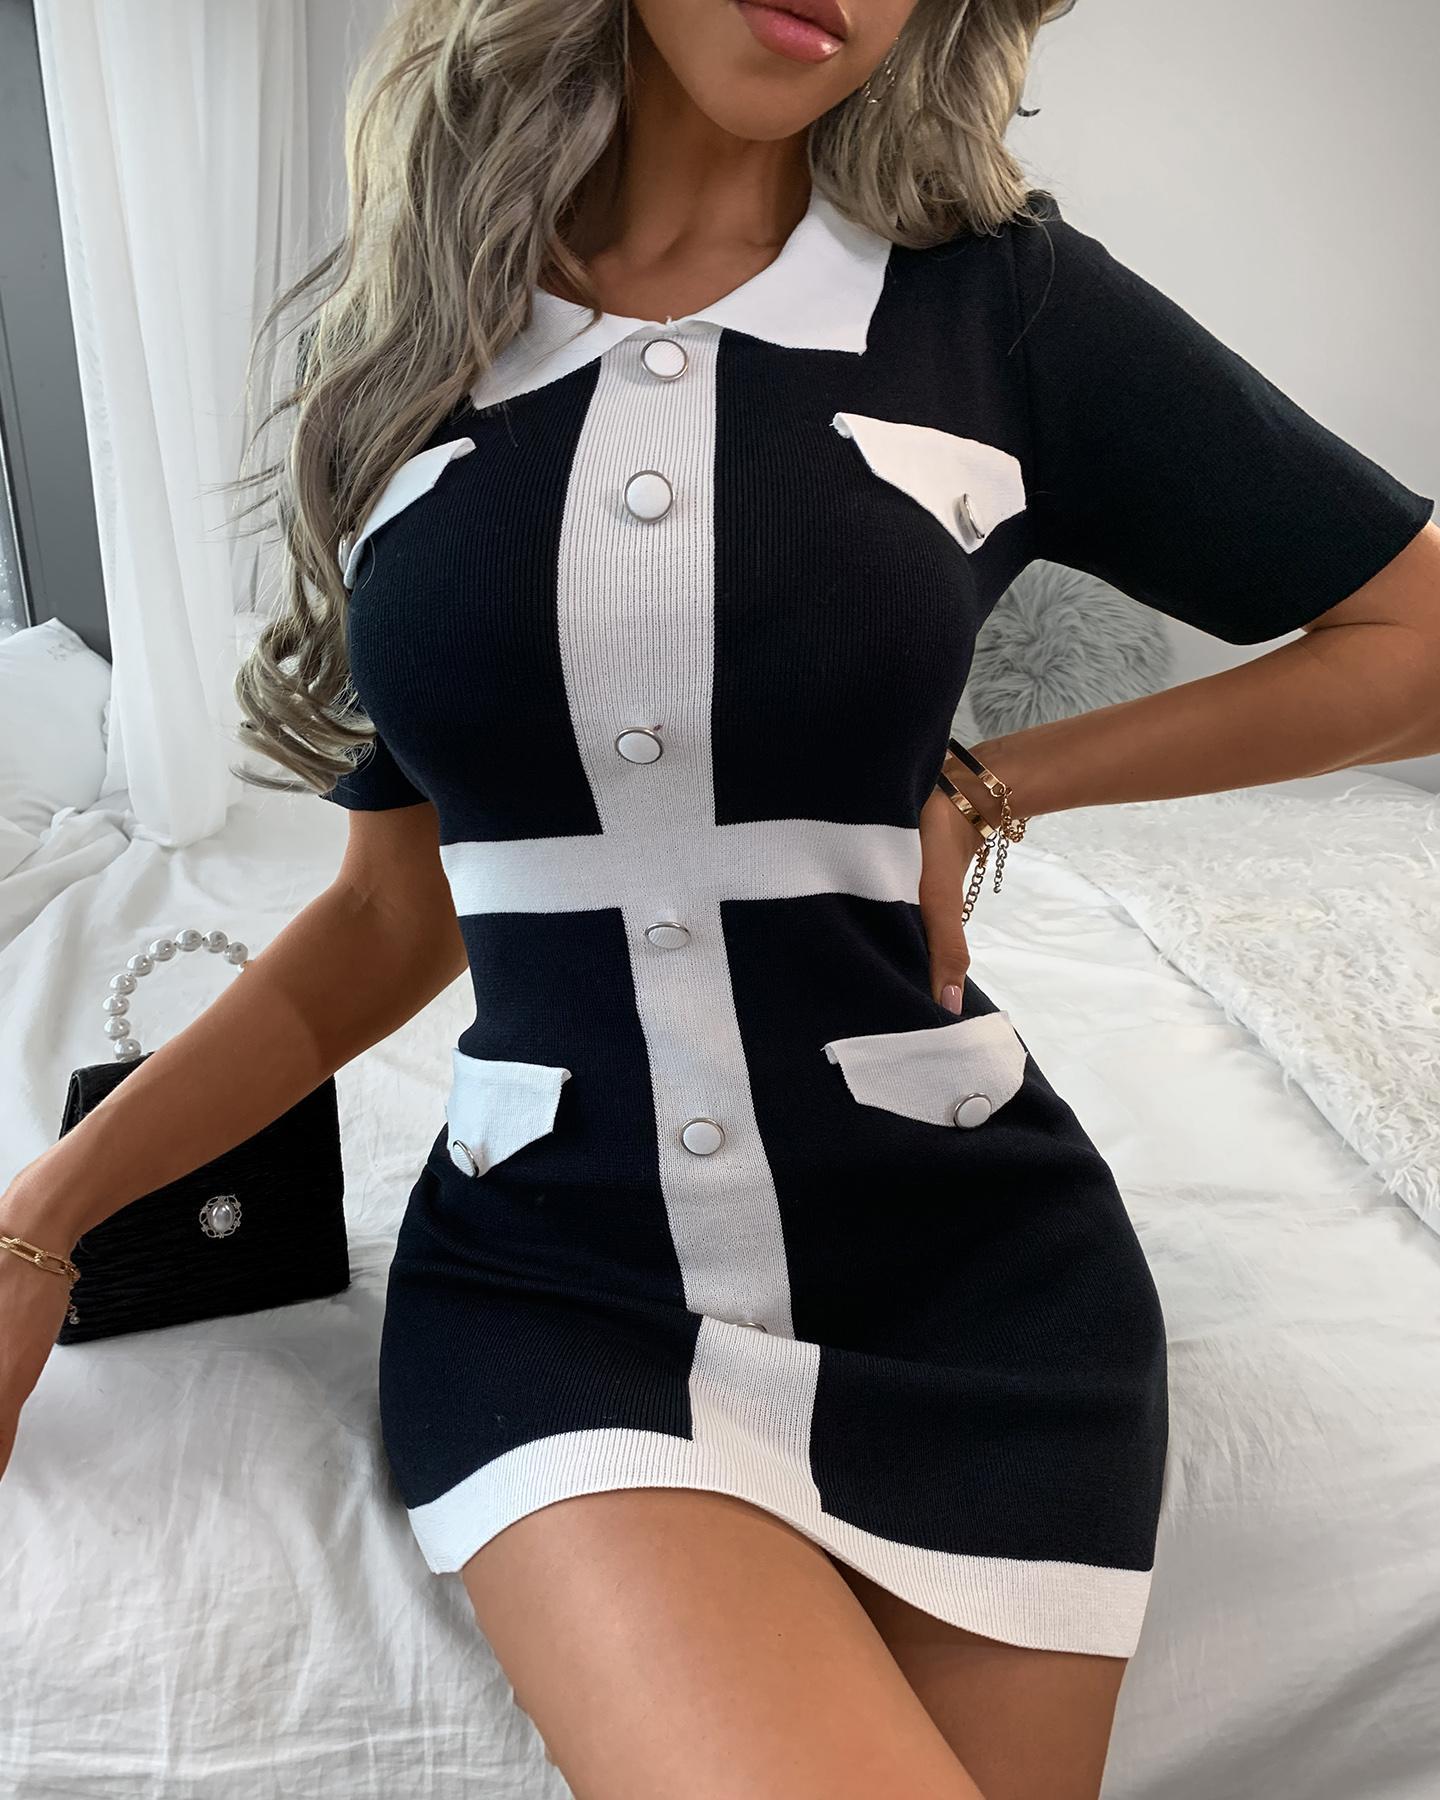 ivrose / Colorblock Button Design Tweed Bodycon Dress